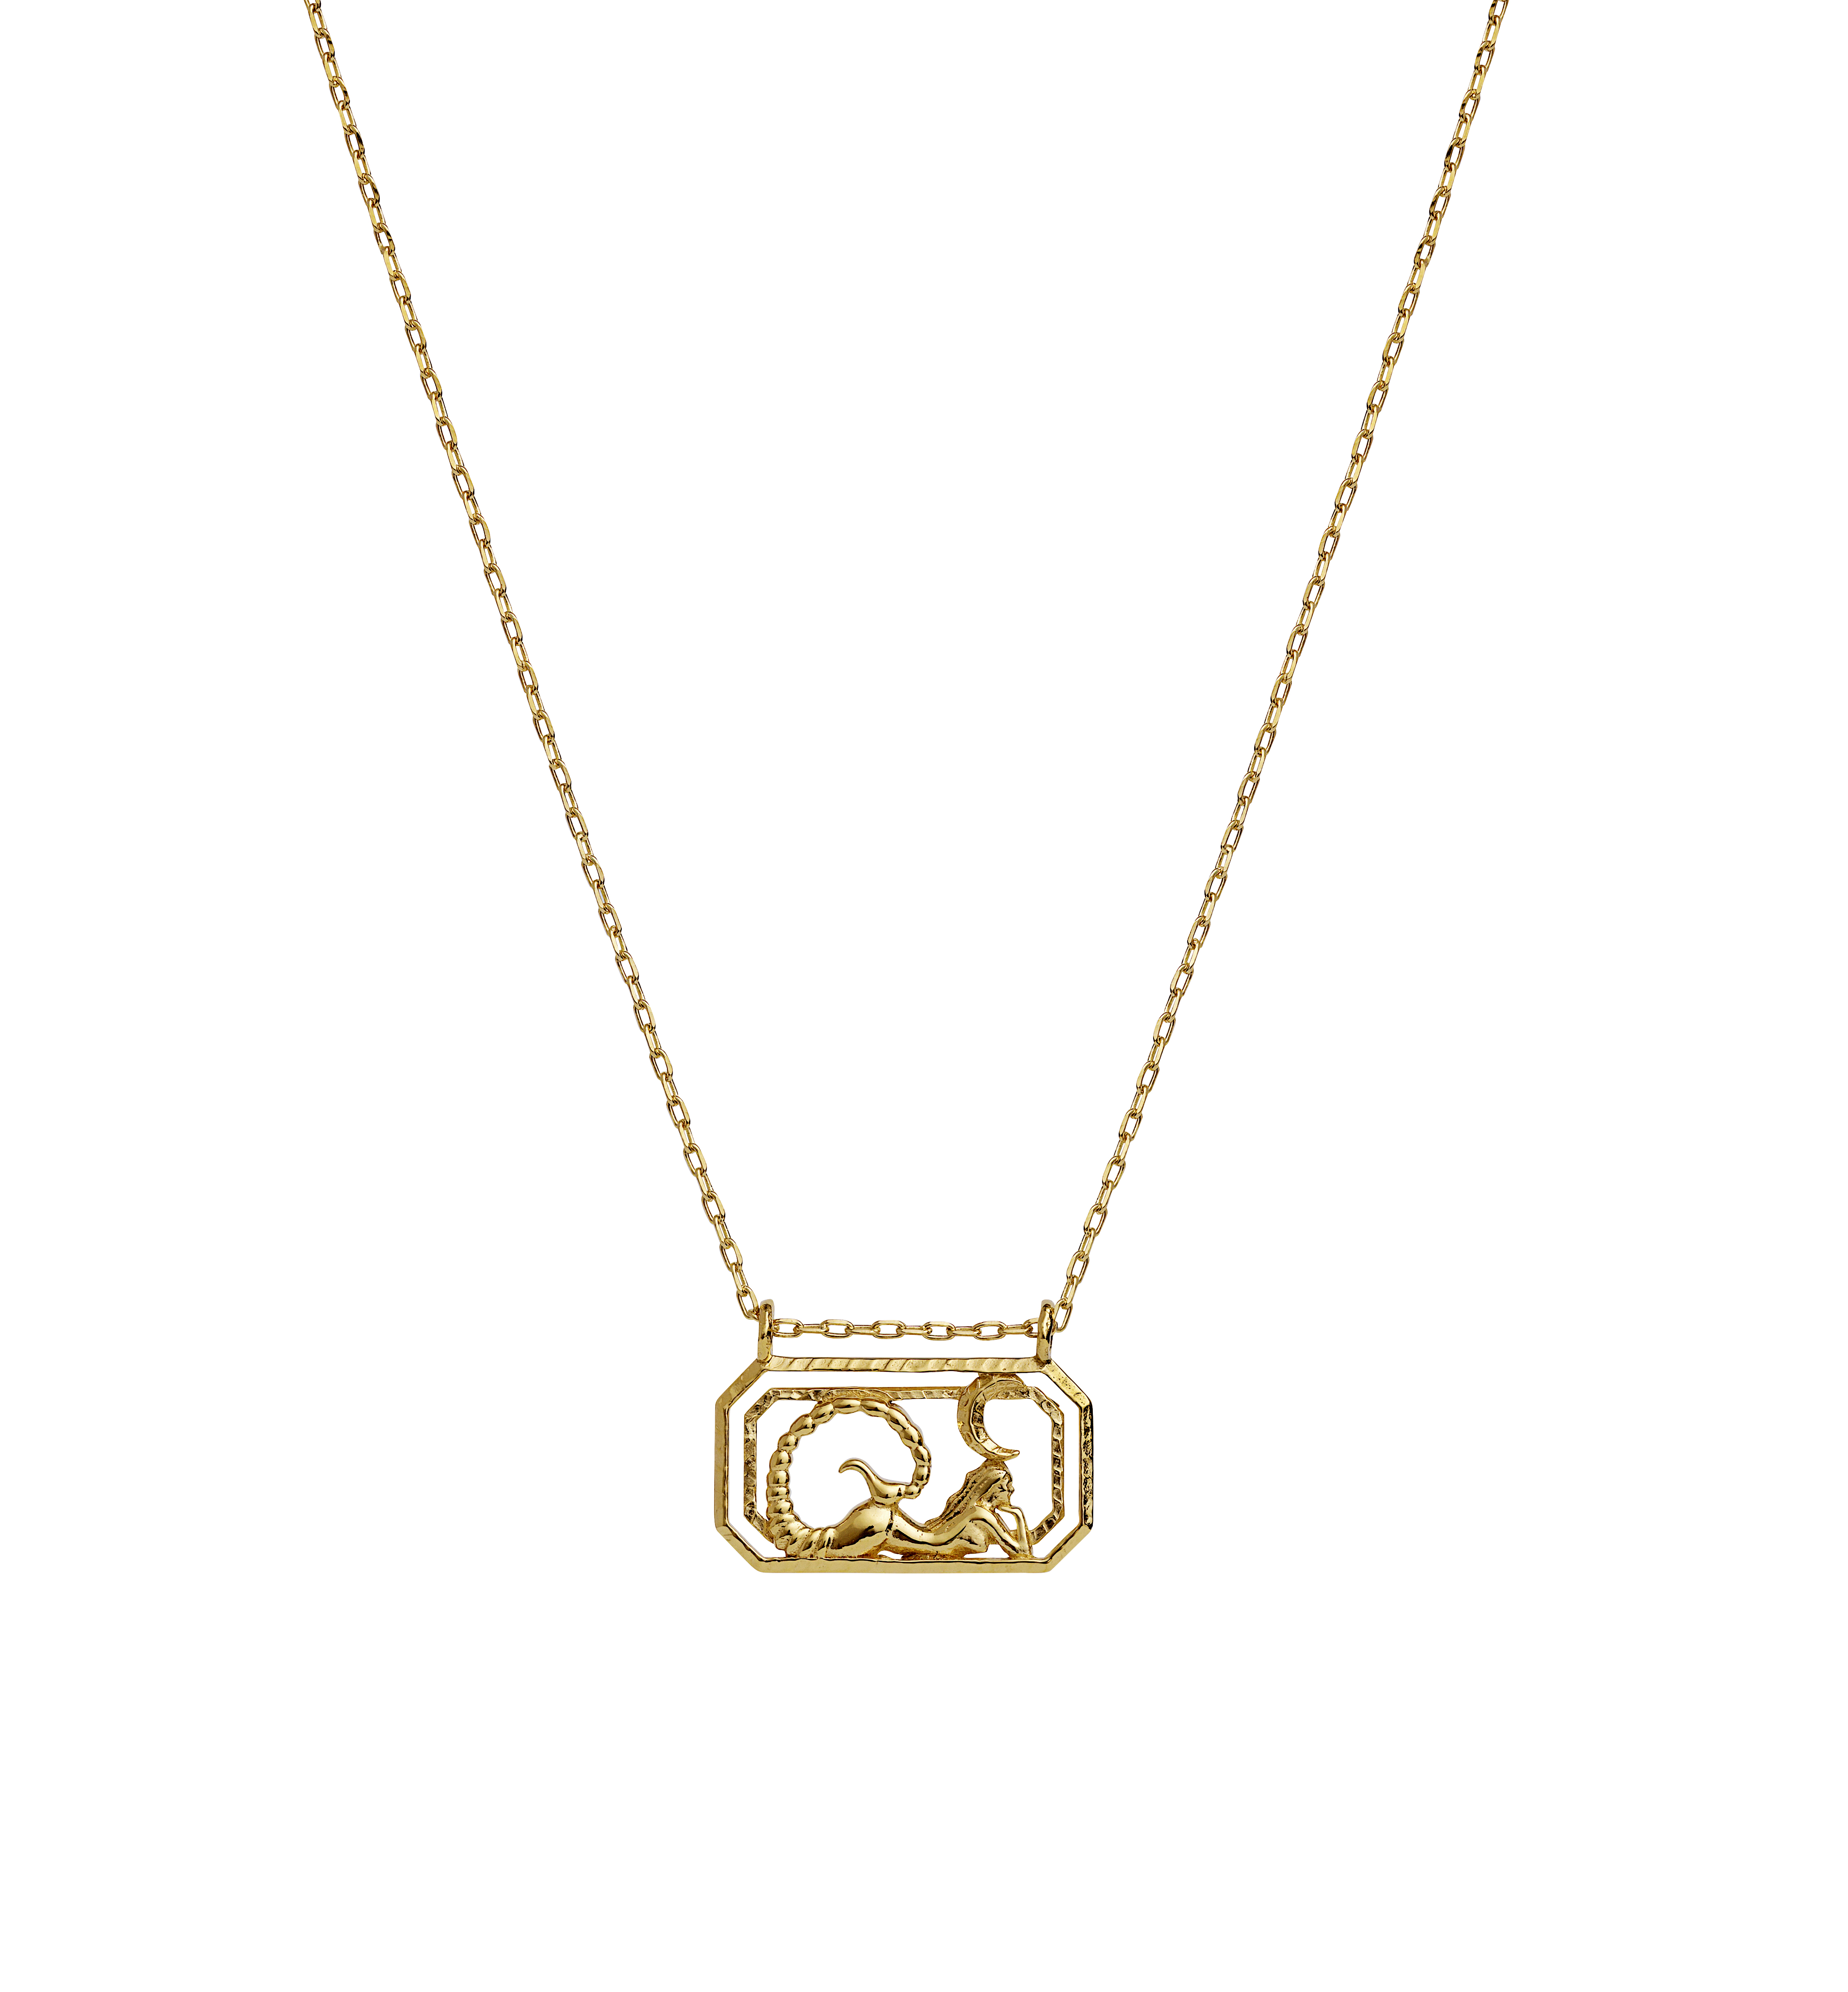 Maanesten Zodiac halskæde, Scorpio, guld, 45 cm